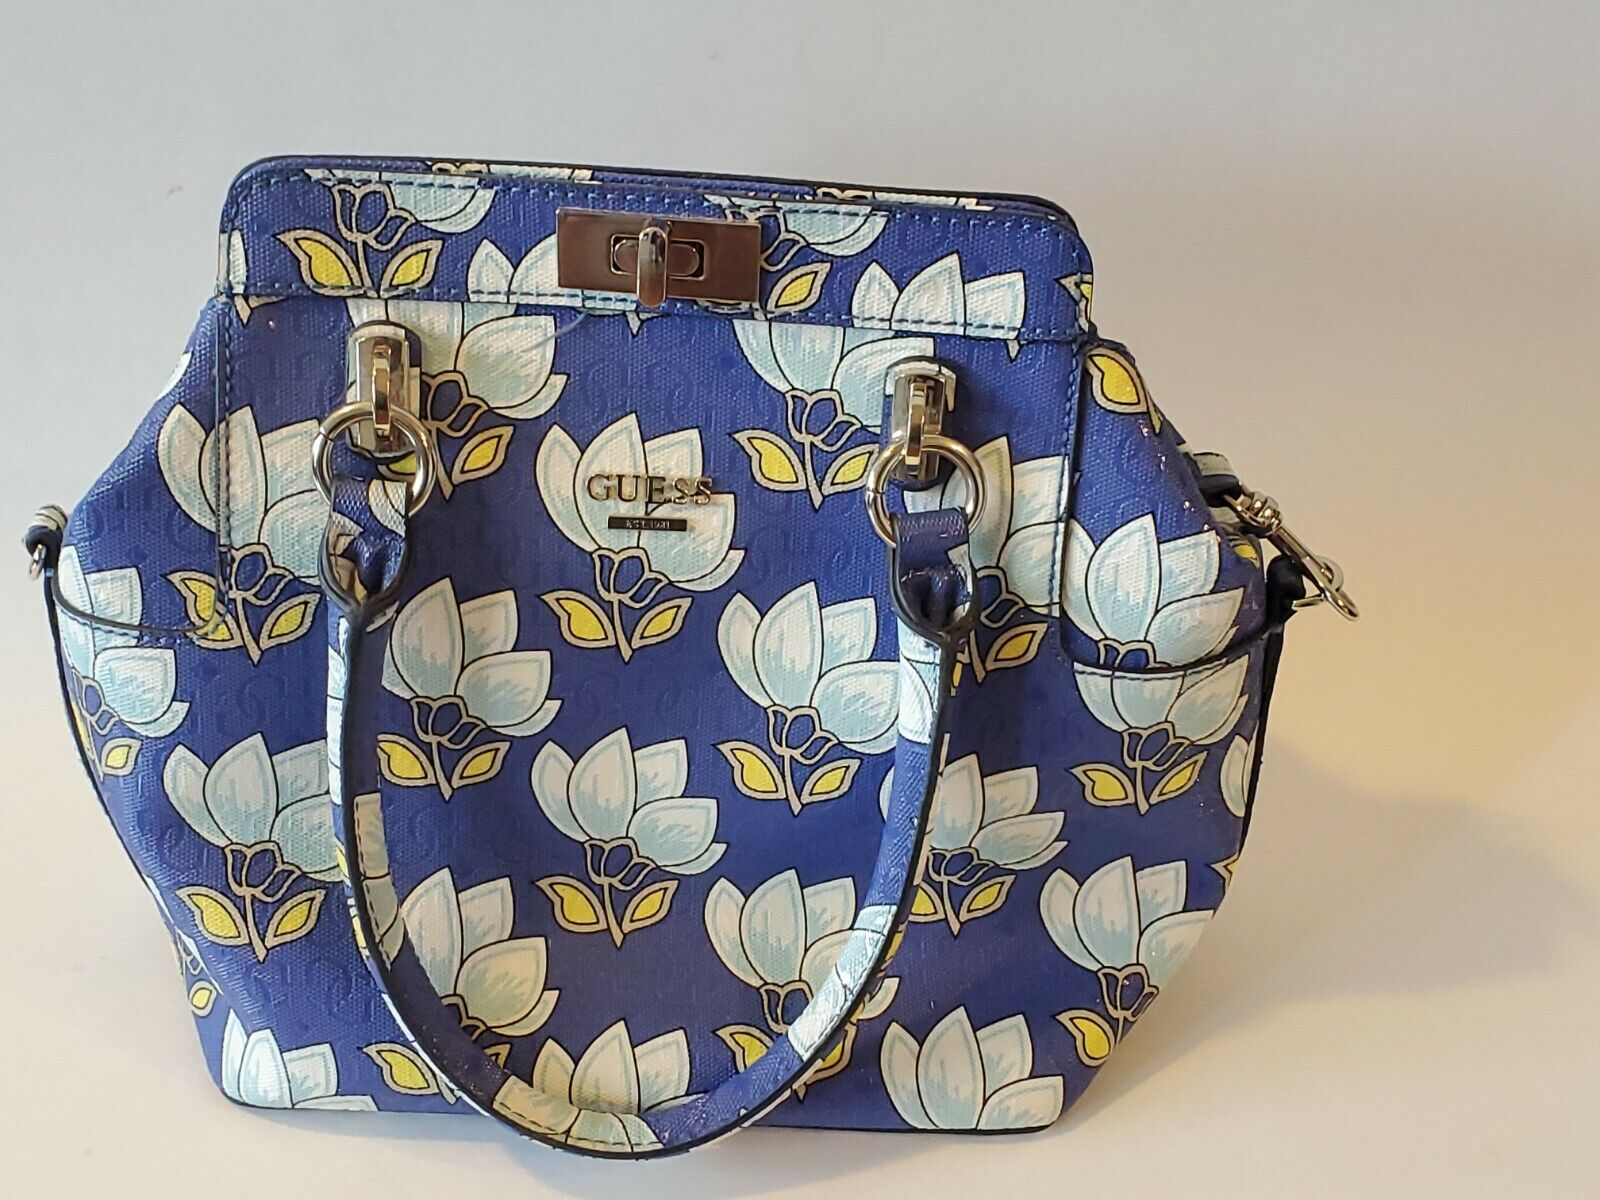 NEW Guess Handbag Floral Declan Satchel